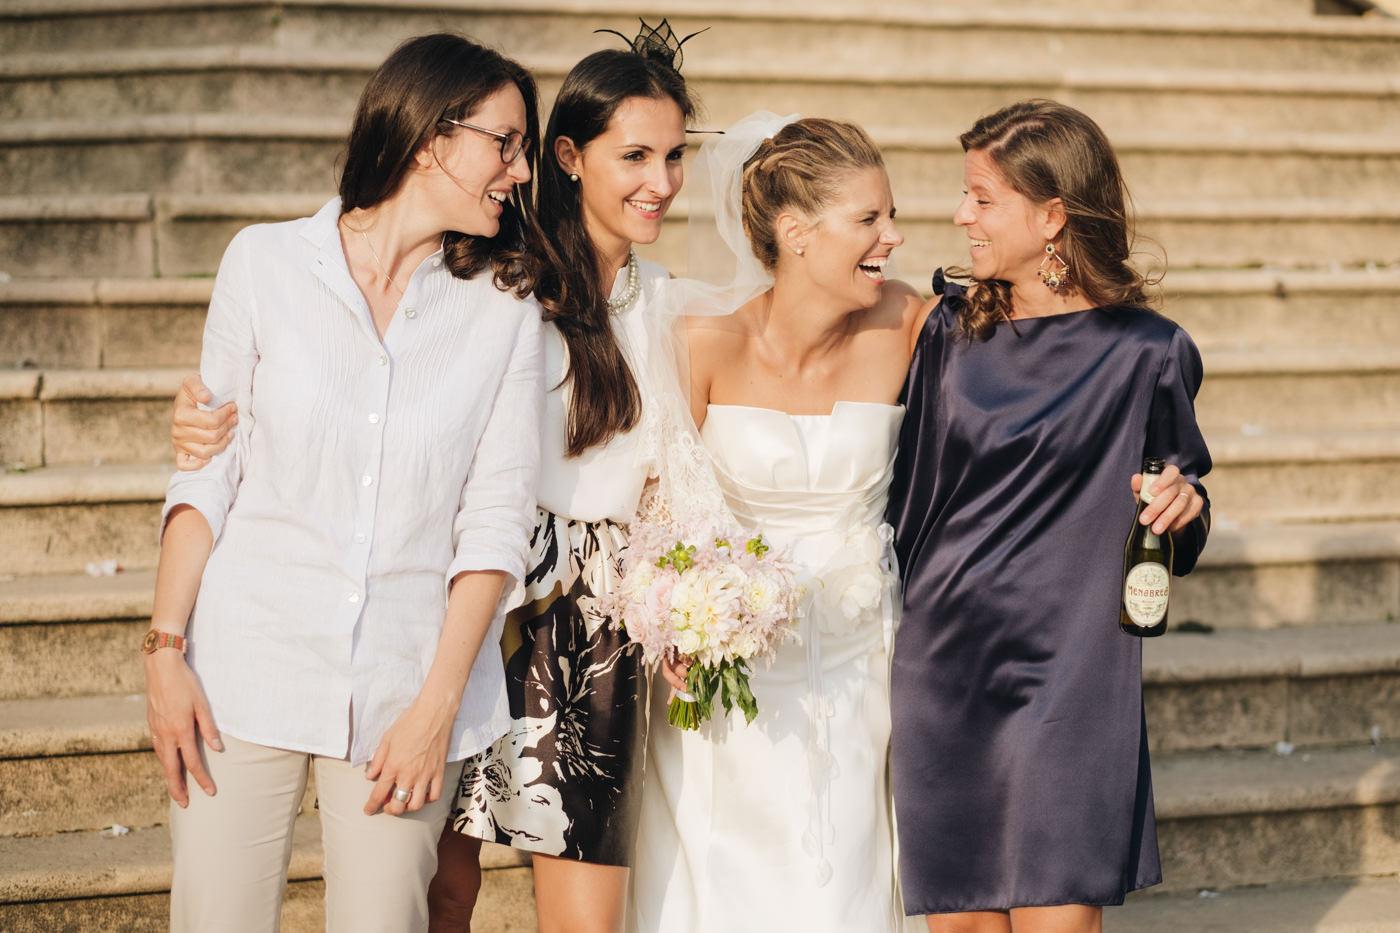 matrimoni_all_italiana_fotografo_matrimonio_cinque_terre-50.jpg